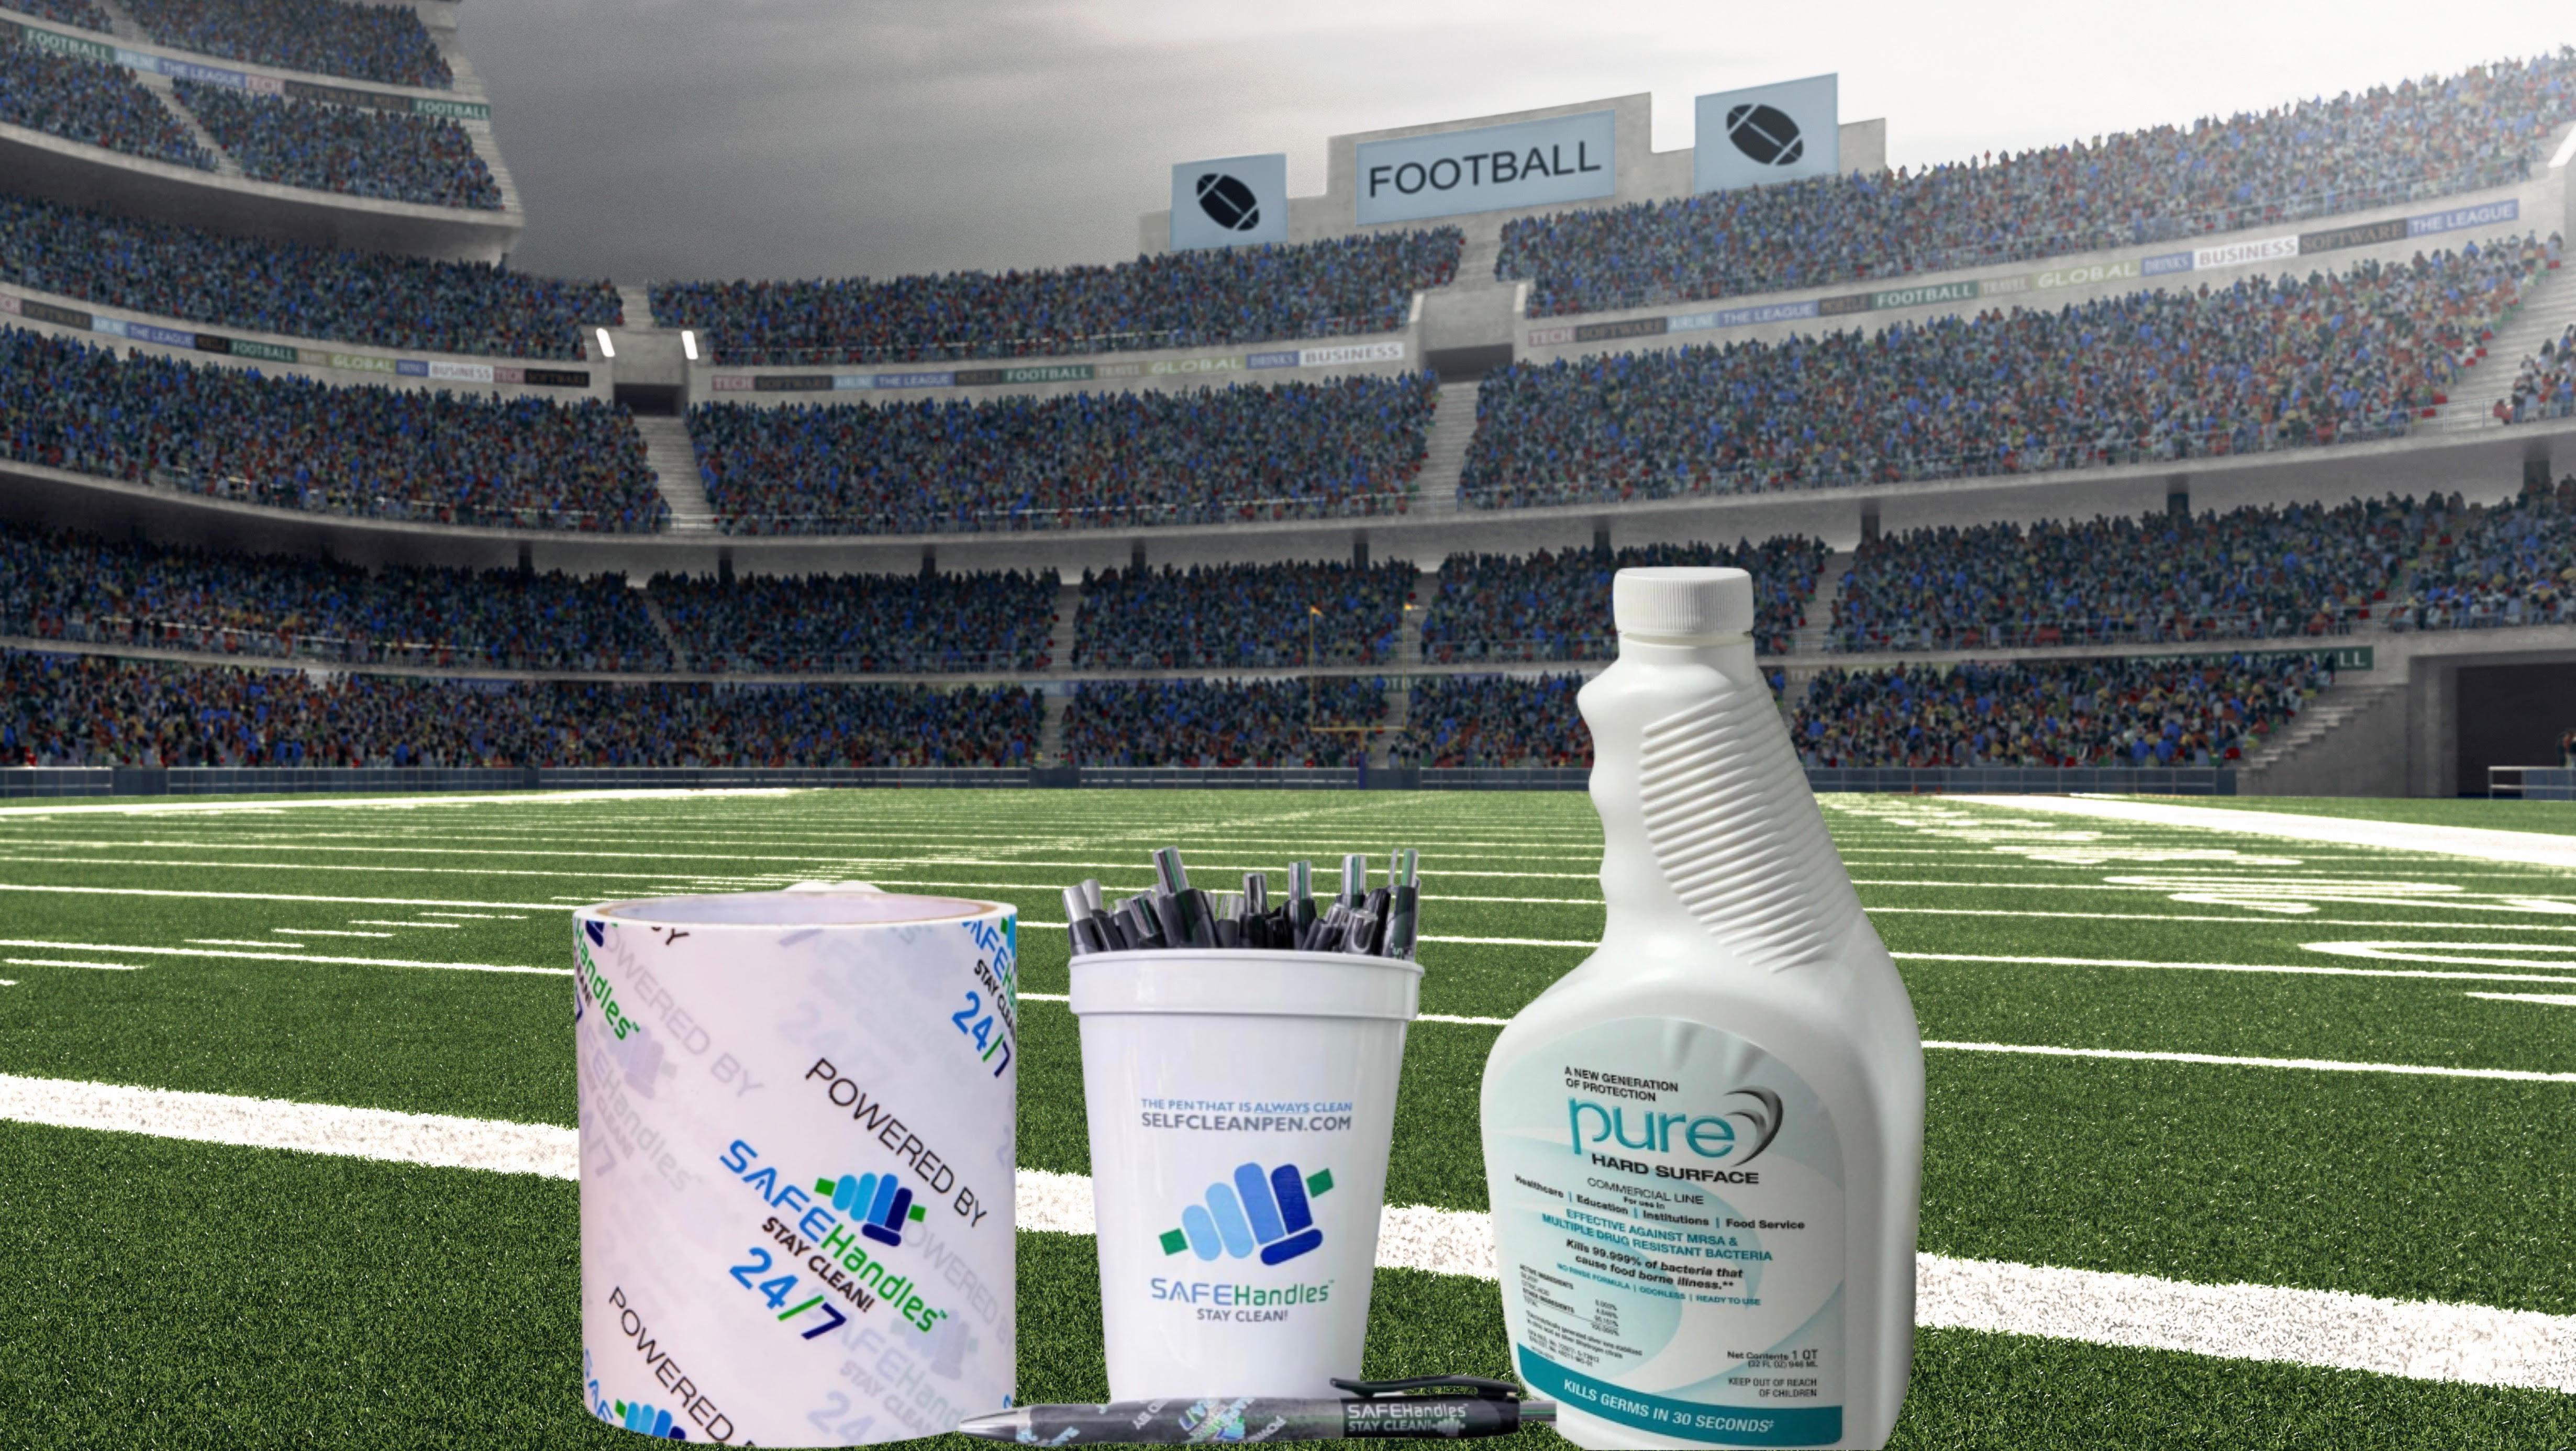 SafeHandles in Stadiums